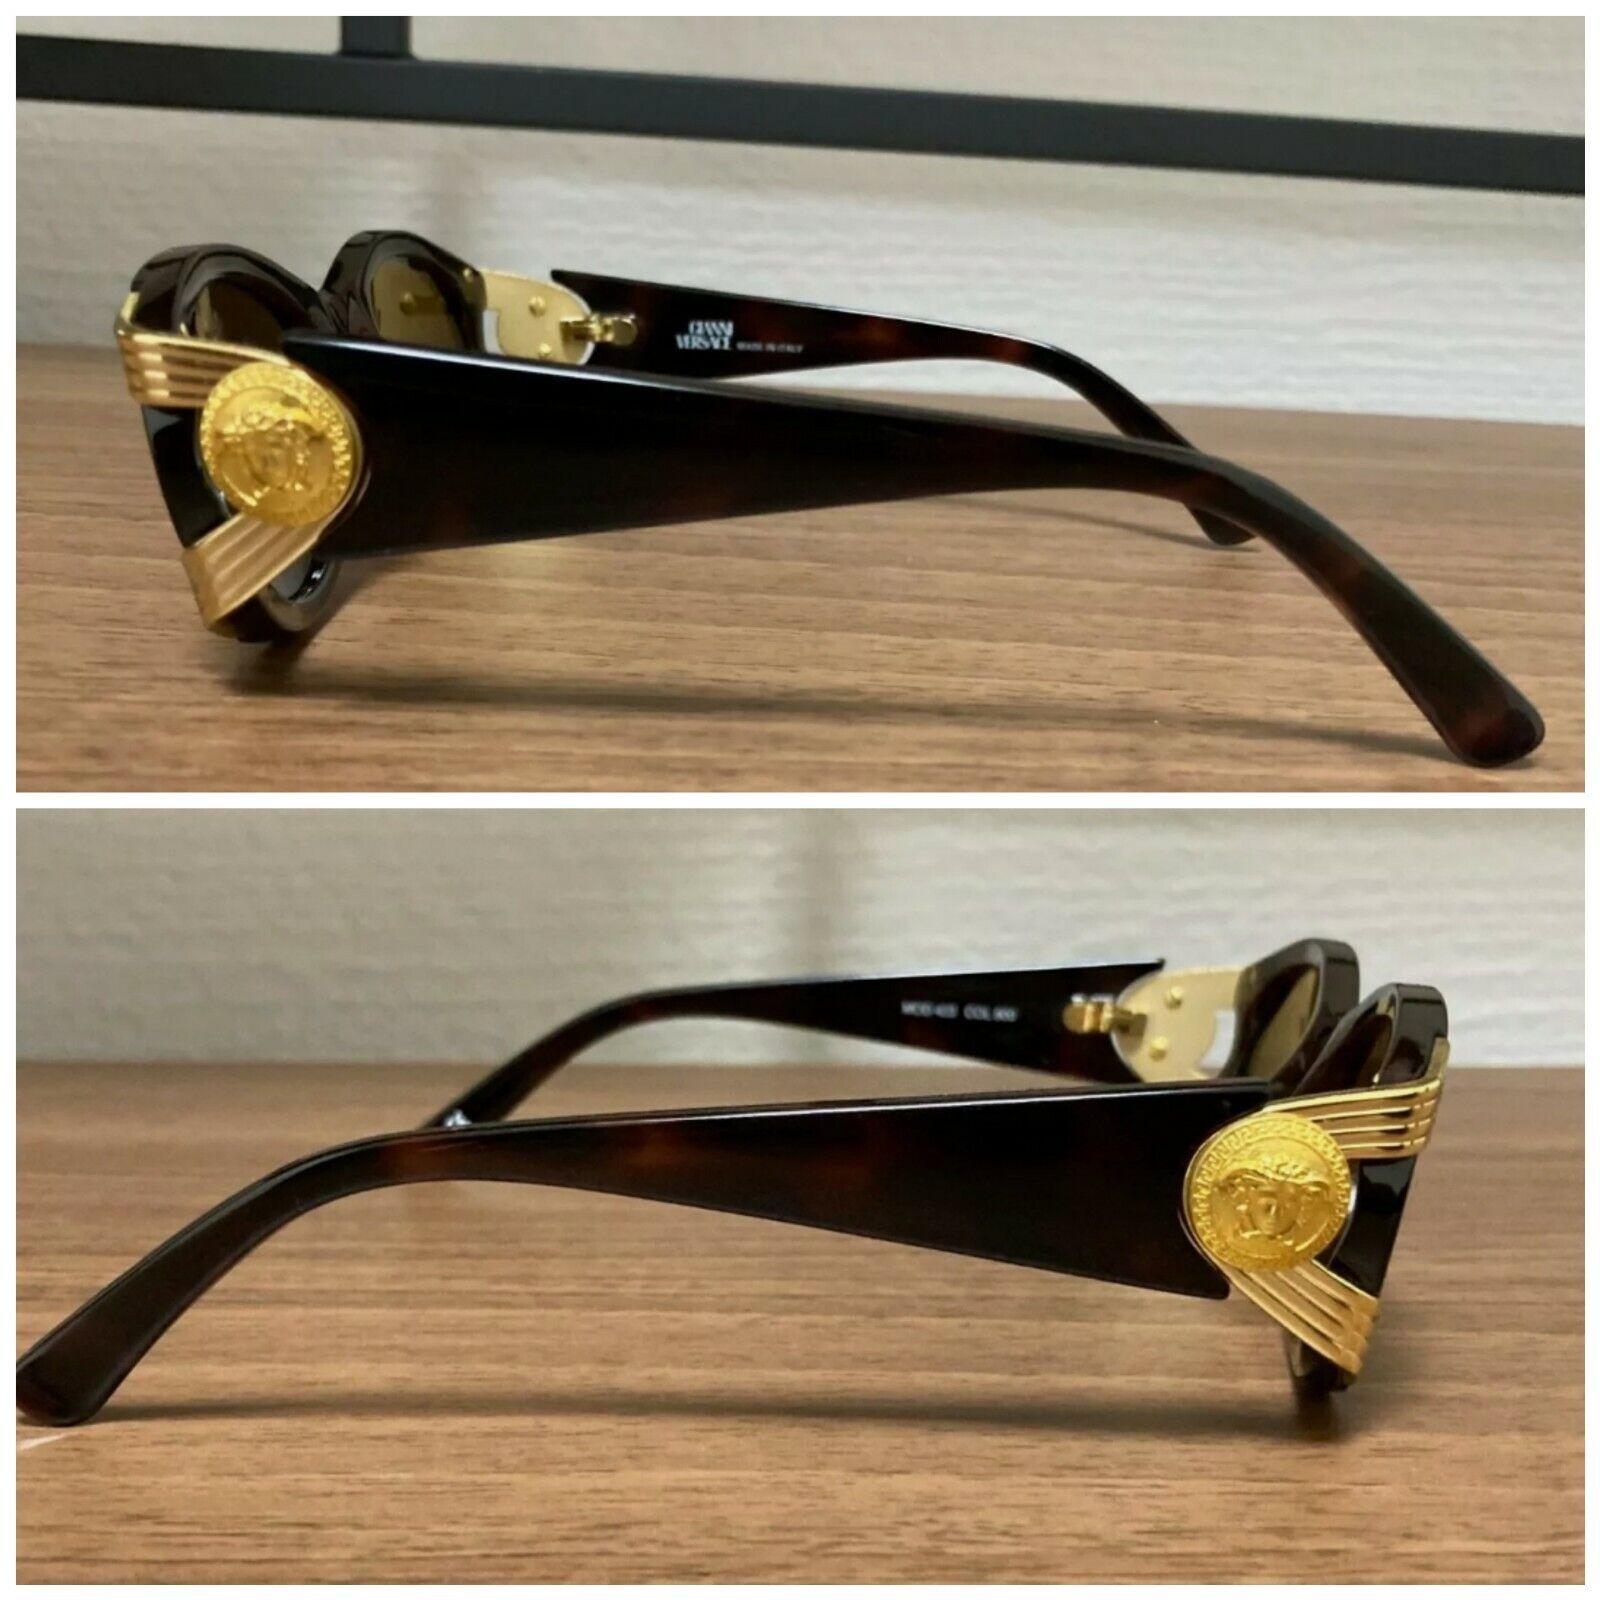 Gianni Versace Vintage Sunglasses Mod 423 - image 2